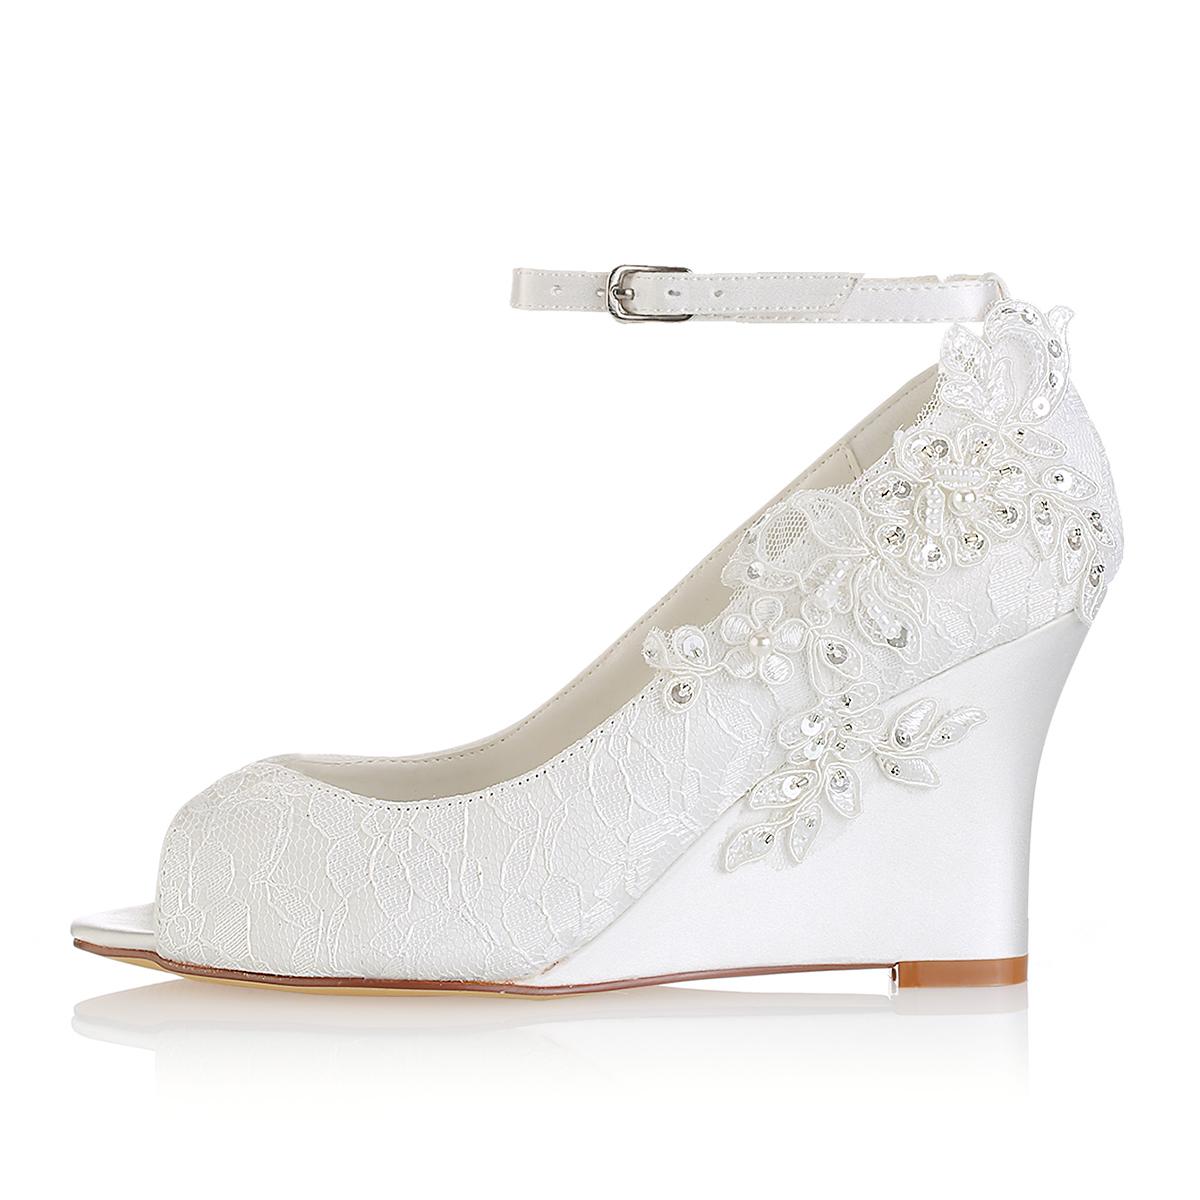 Lace Wedding Shoes.Peep Toe Wedges Wedding Shoes Wedge Heel Lace Wedding Shoes With Appliqued Buckle Imitation Pearl Sequins Feeltimes